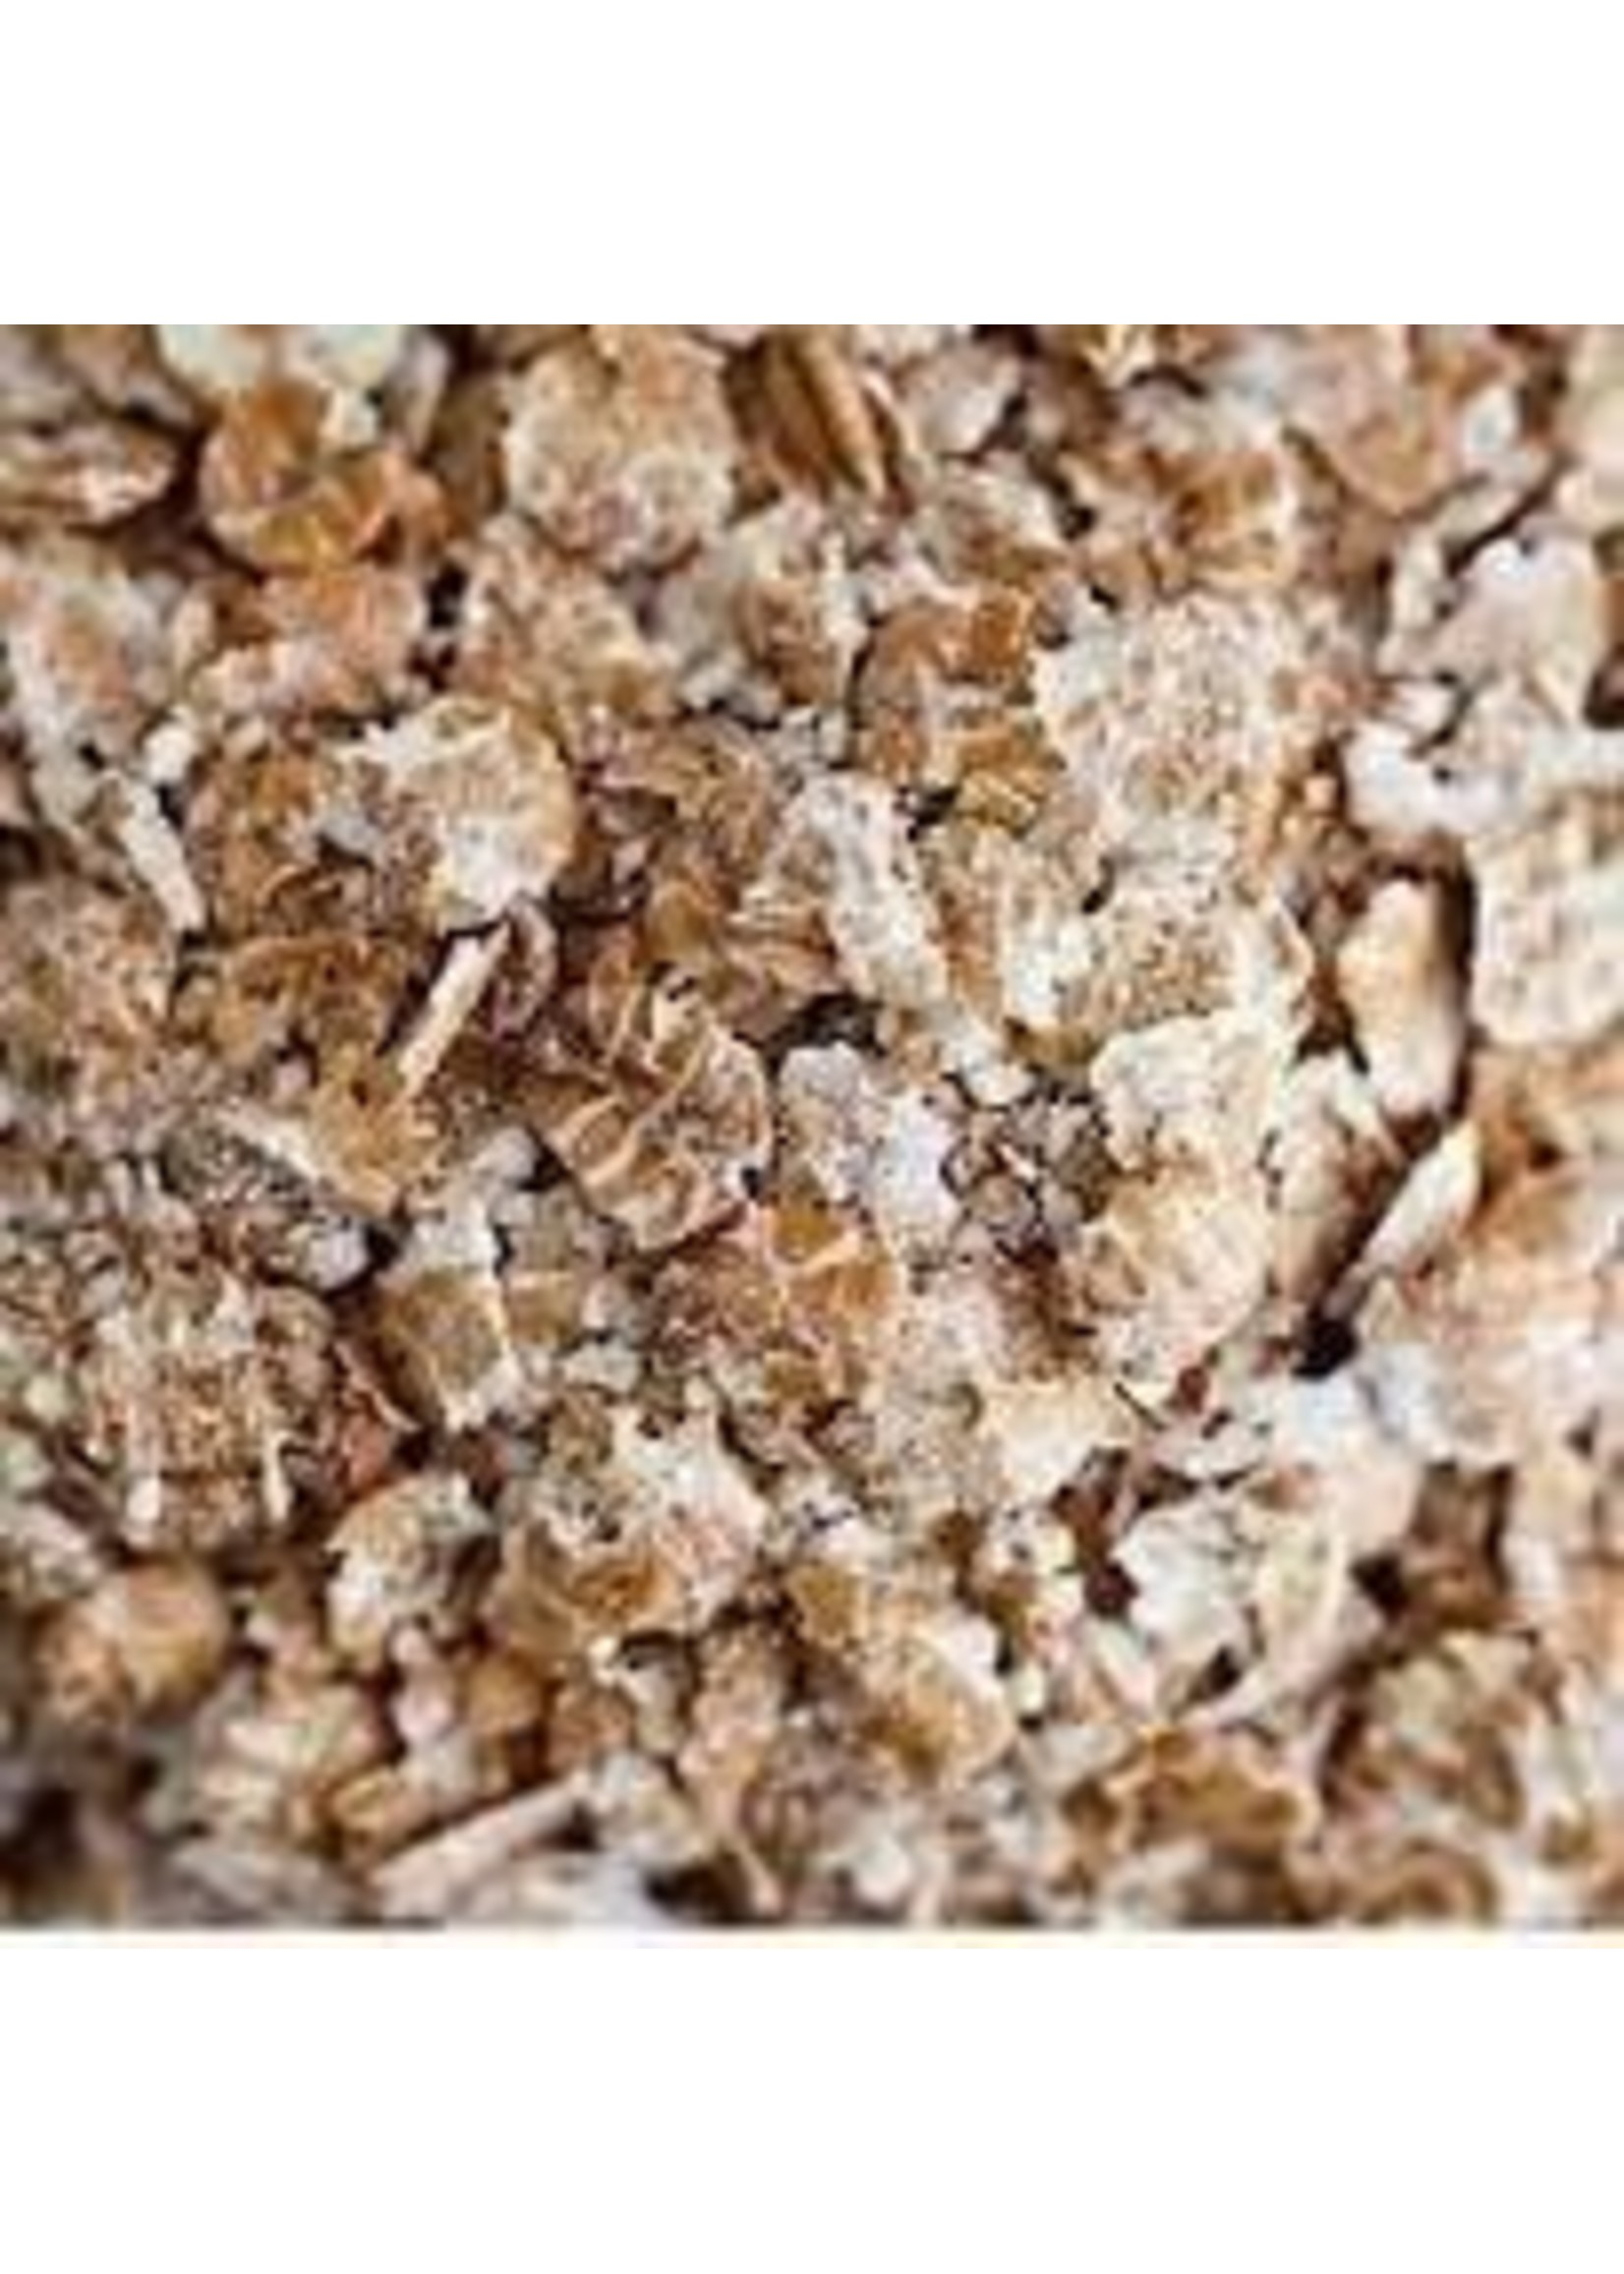 Grain Flaked White Wheat - 1 LB